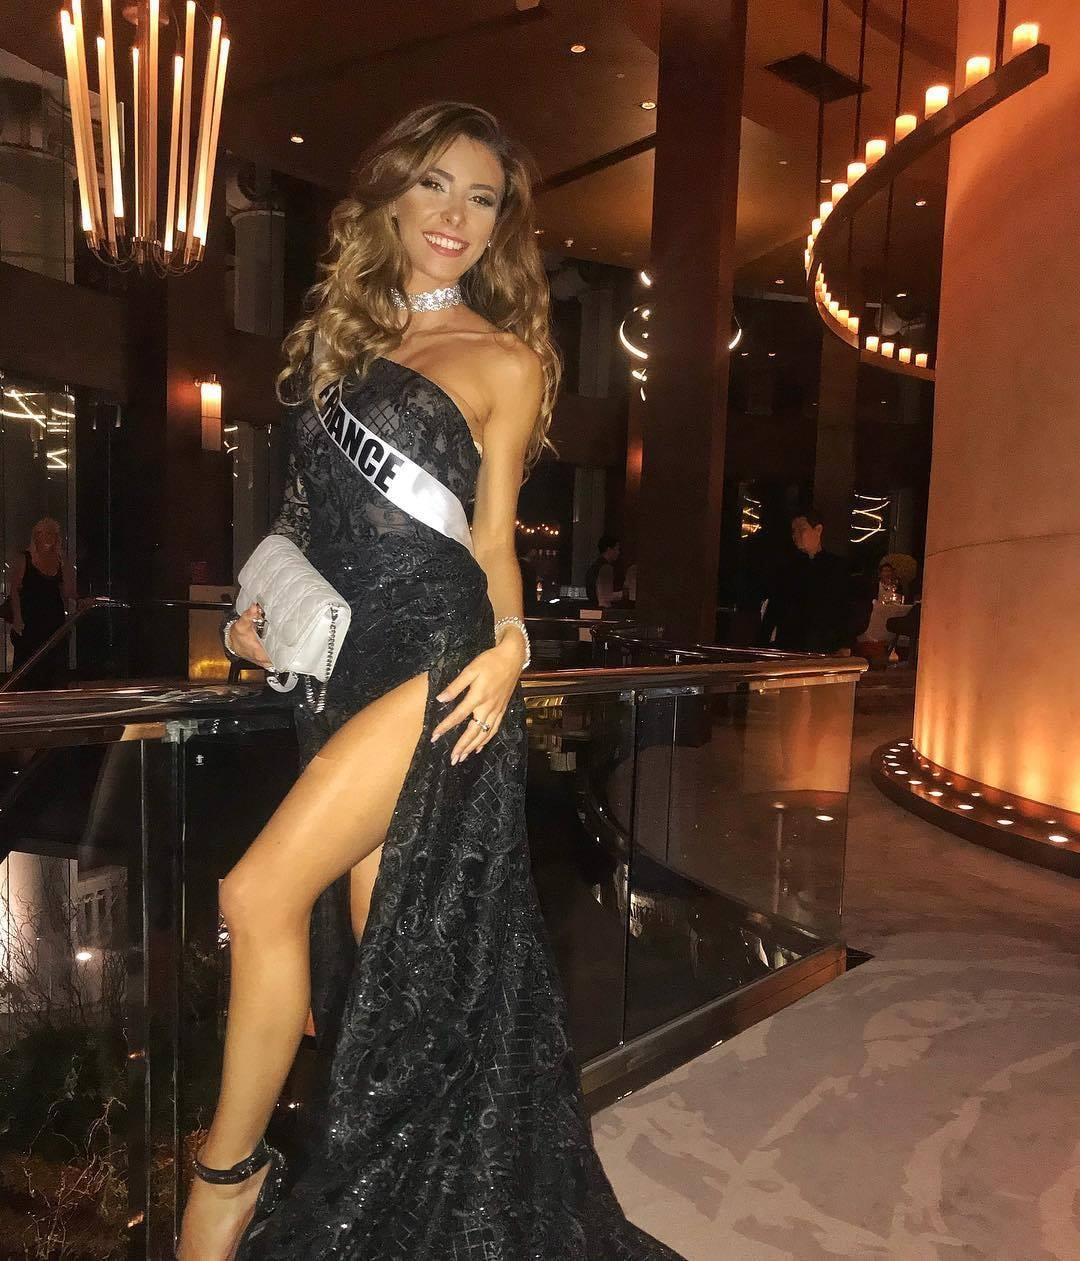 welcome dinner de candidatas a miss universe 2018. - Página 11 Clcev3km